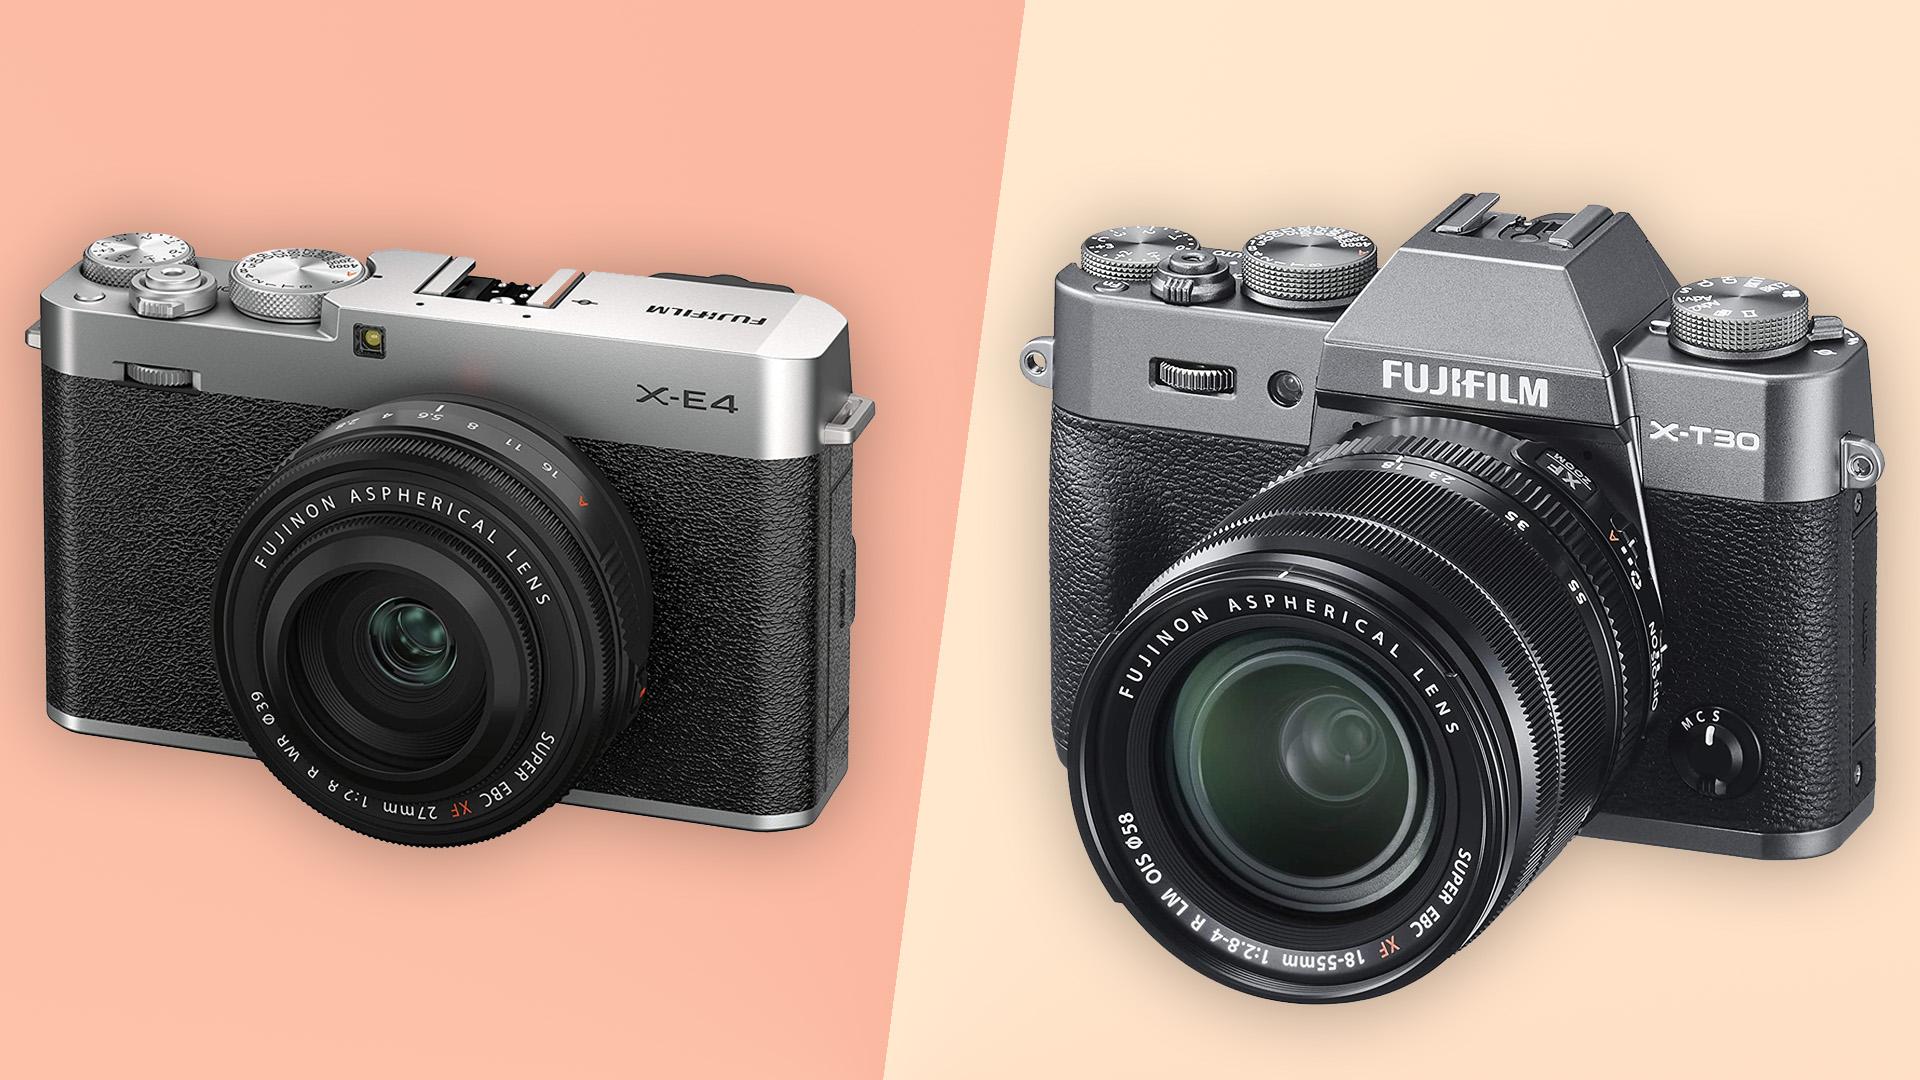 Fujifilm X-E4 vs Fujifilm X-T30